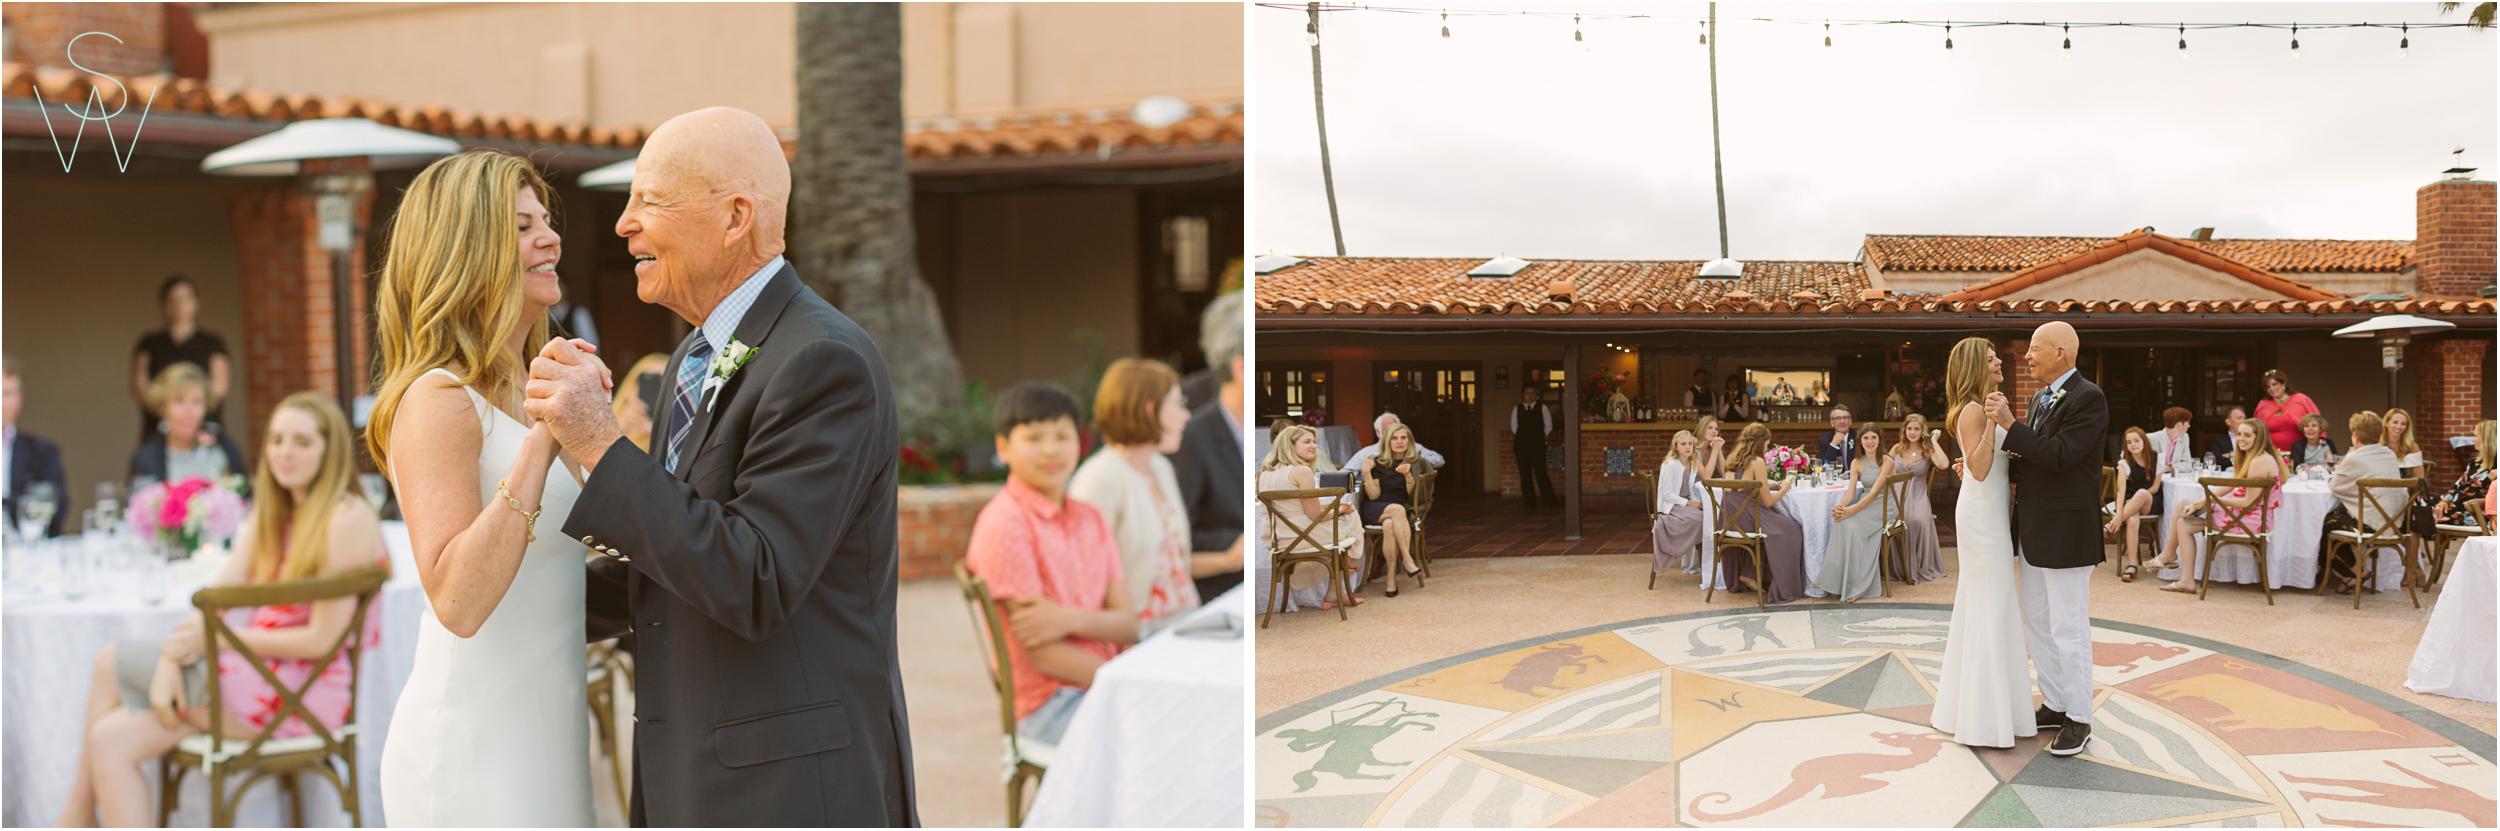 shewanders.wedding.photography.la.jolla-1053.jpg